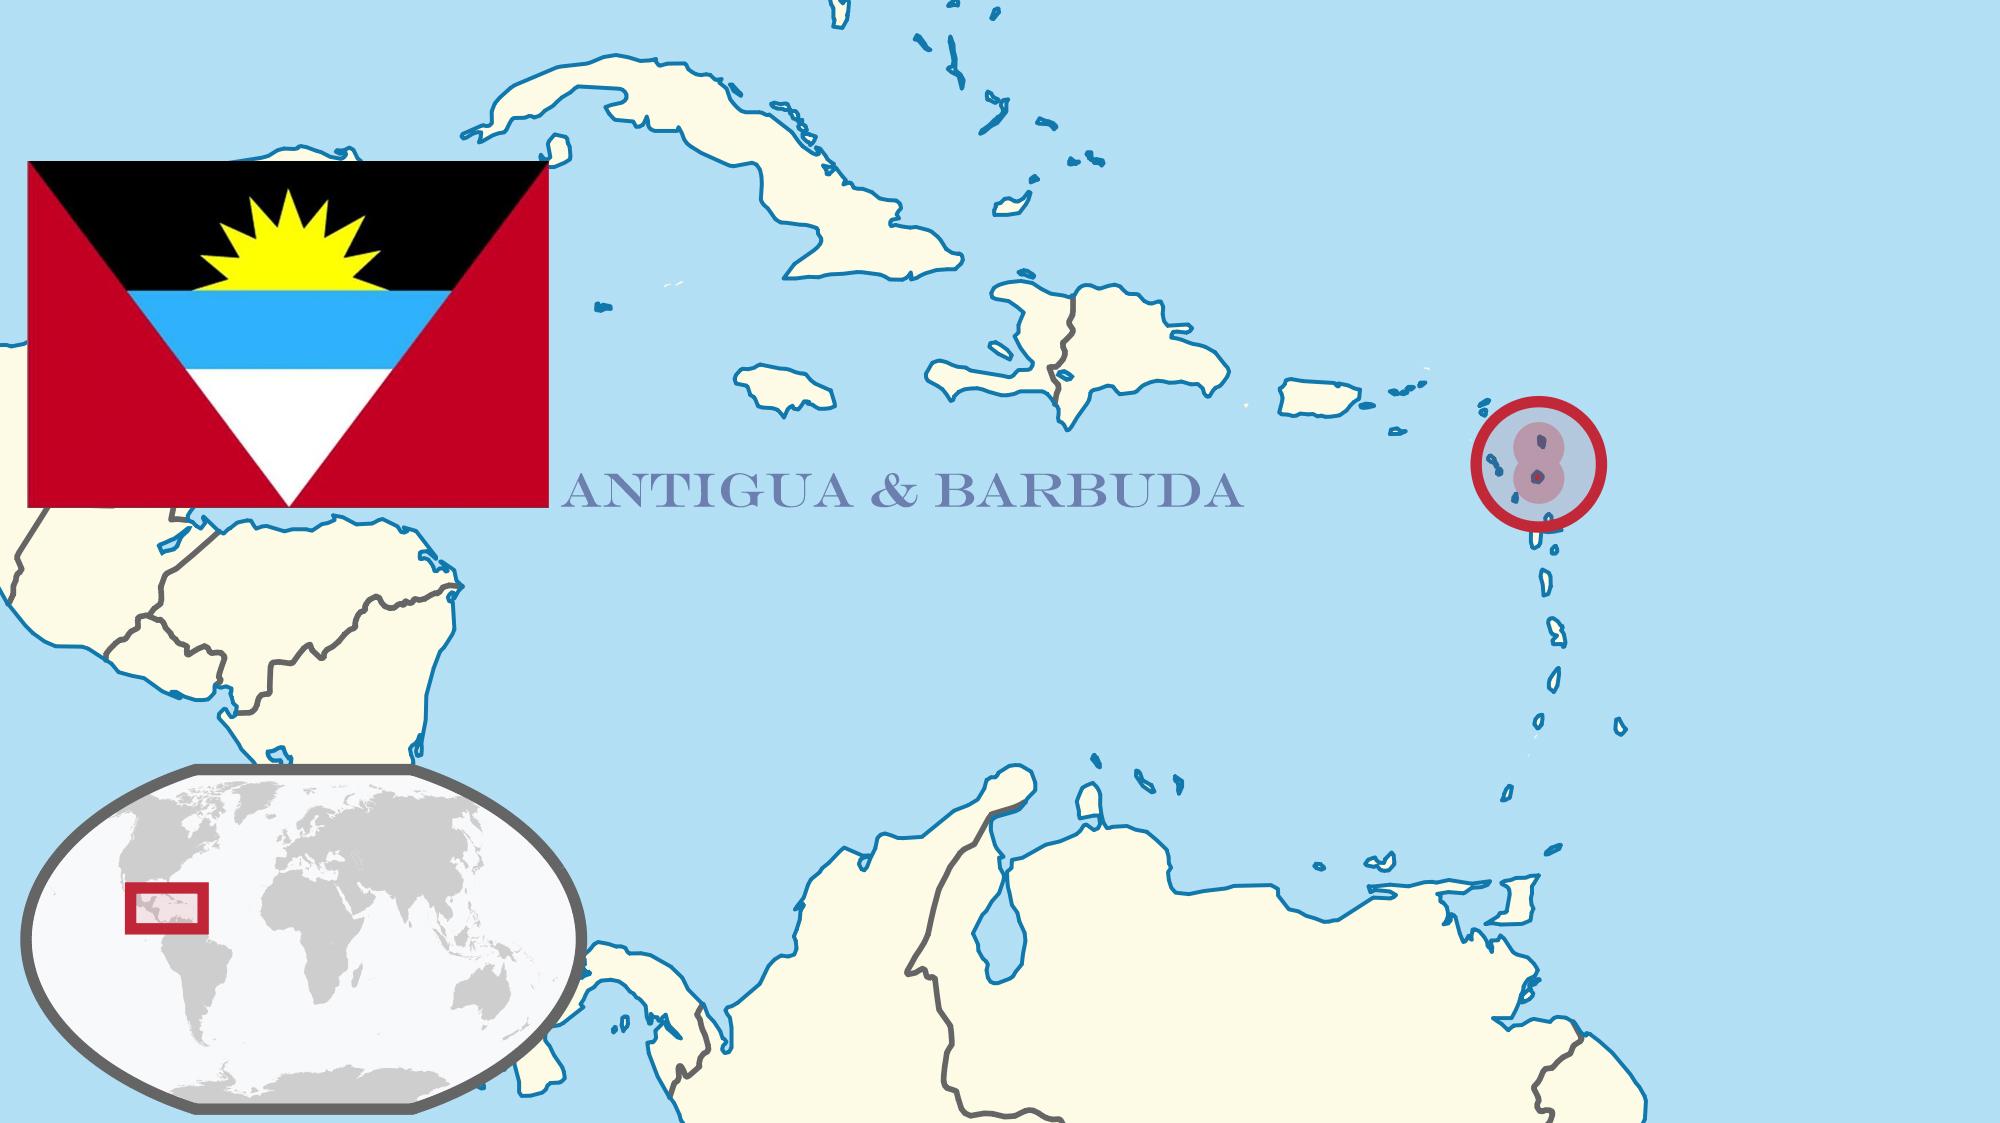 Map of Antigua & Barbuda